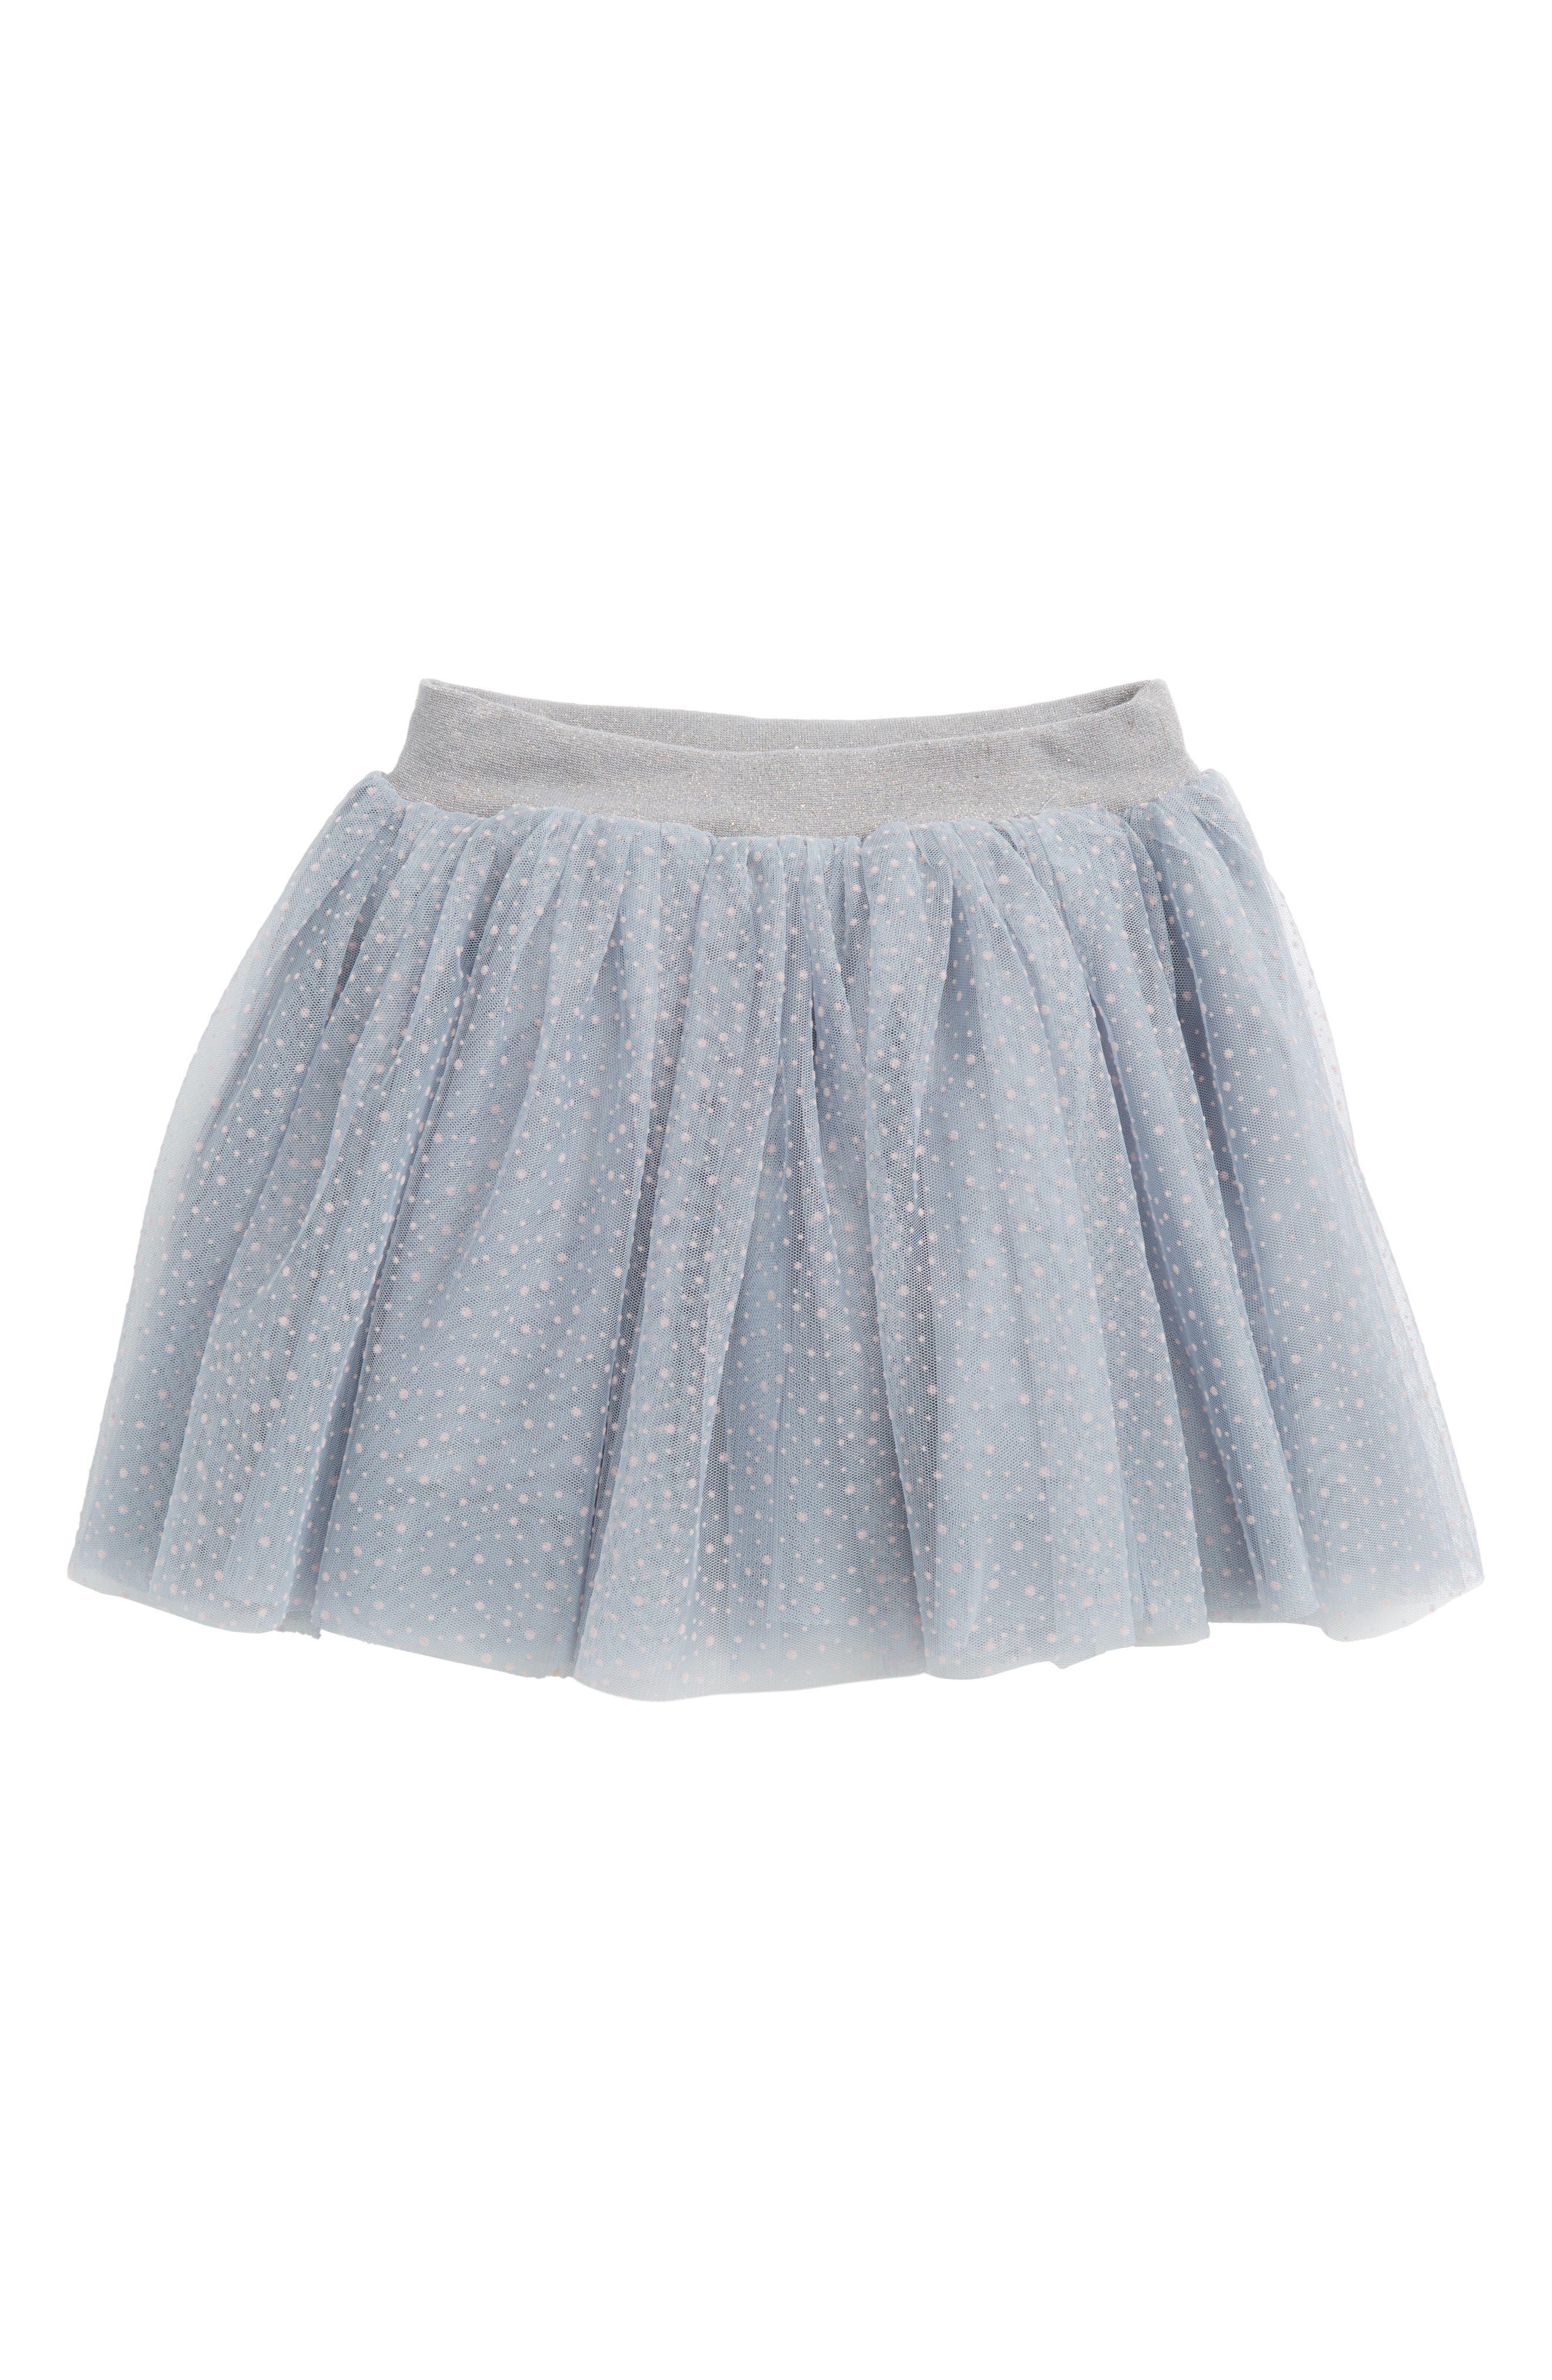 Mina Skirt,                         Main,                         color, Dove